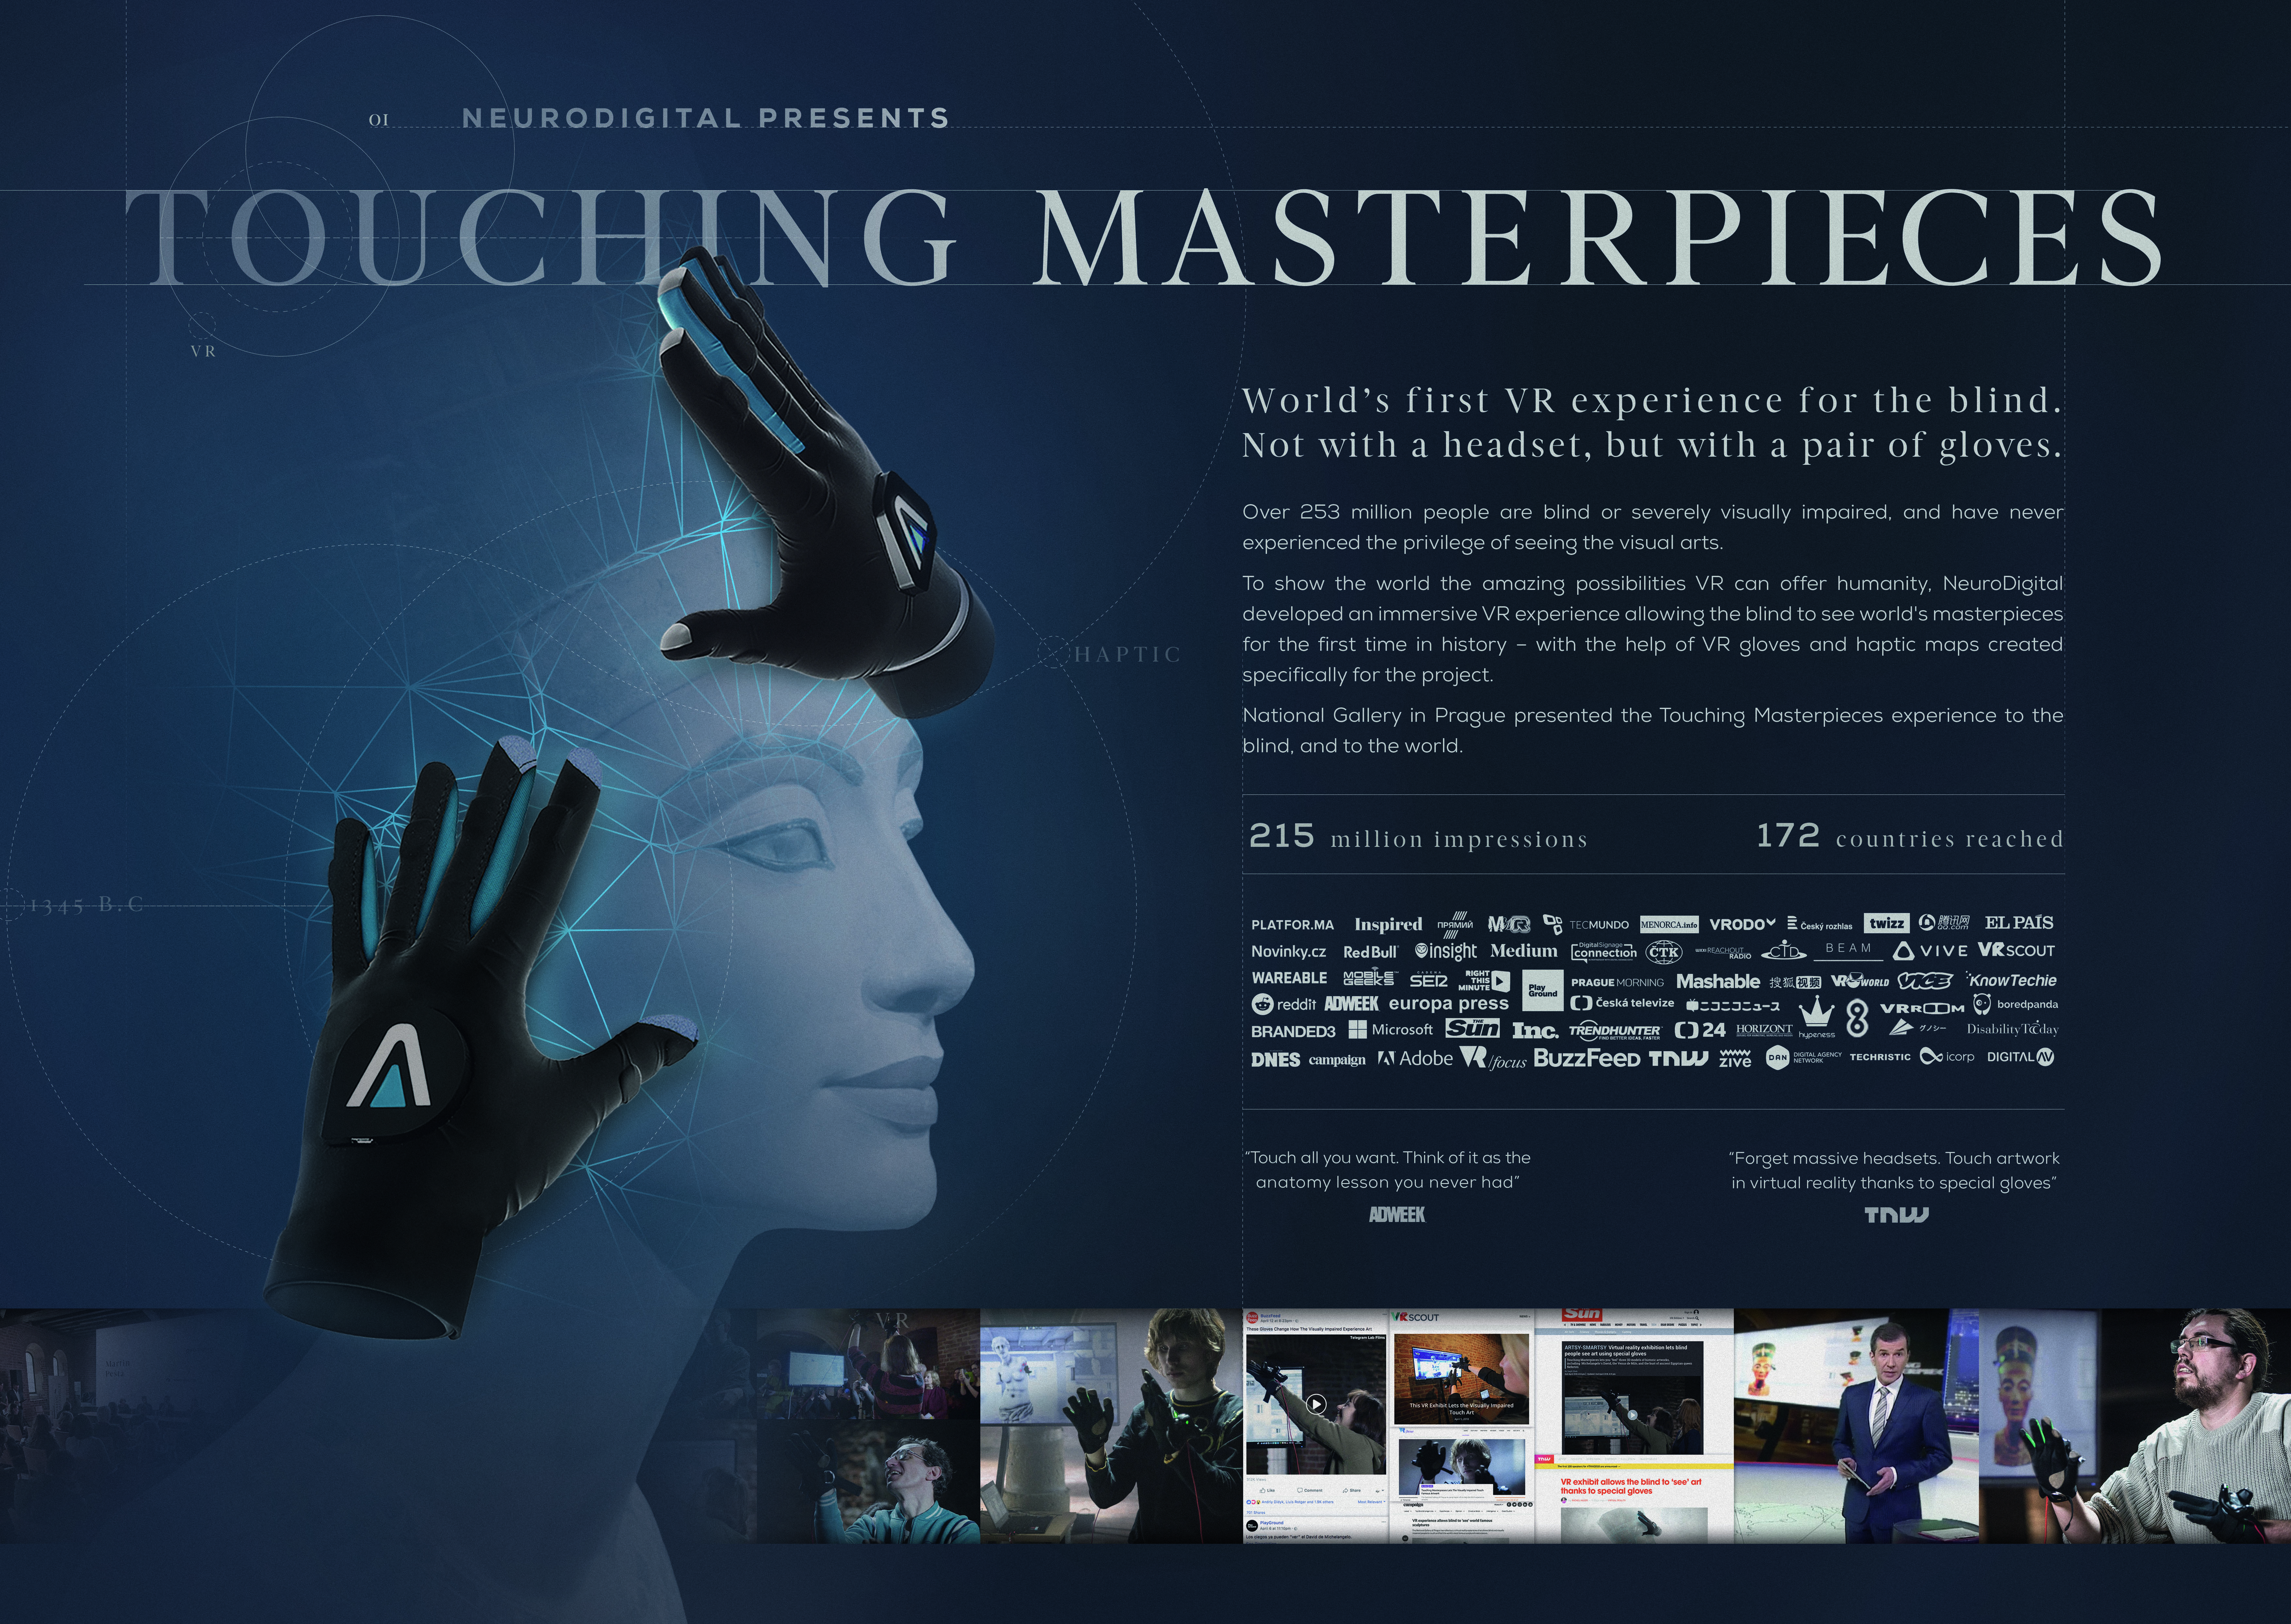 Touching Masterpieces Thumbnail